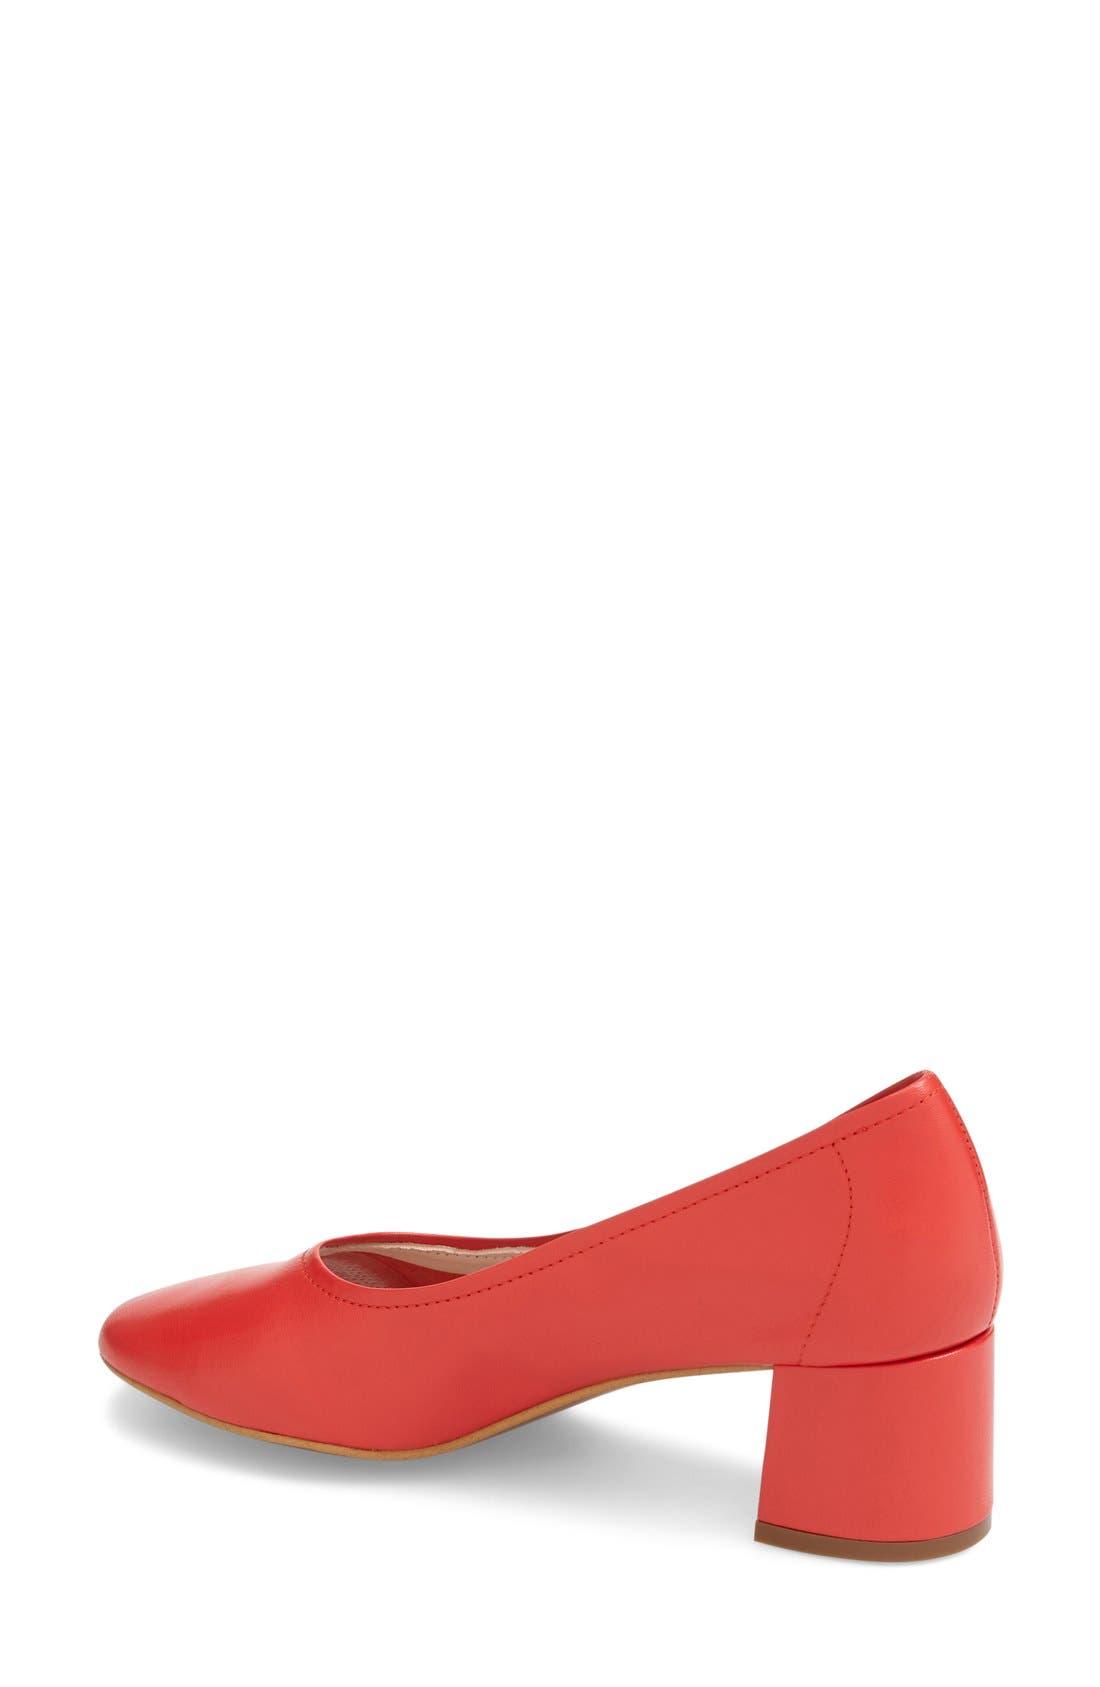 'Juno' Ballet Shoe,                             Alternate thumbnail 9, color,